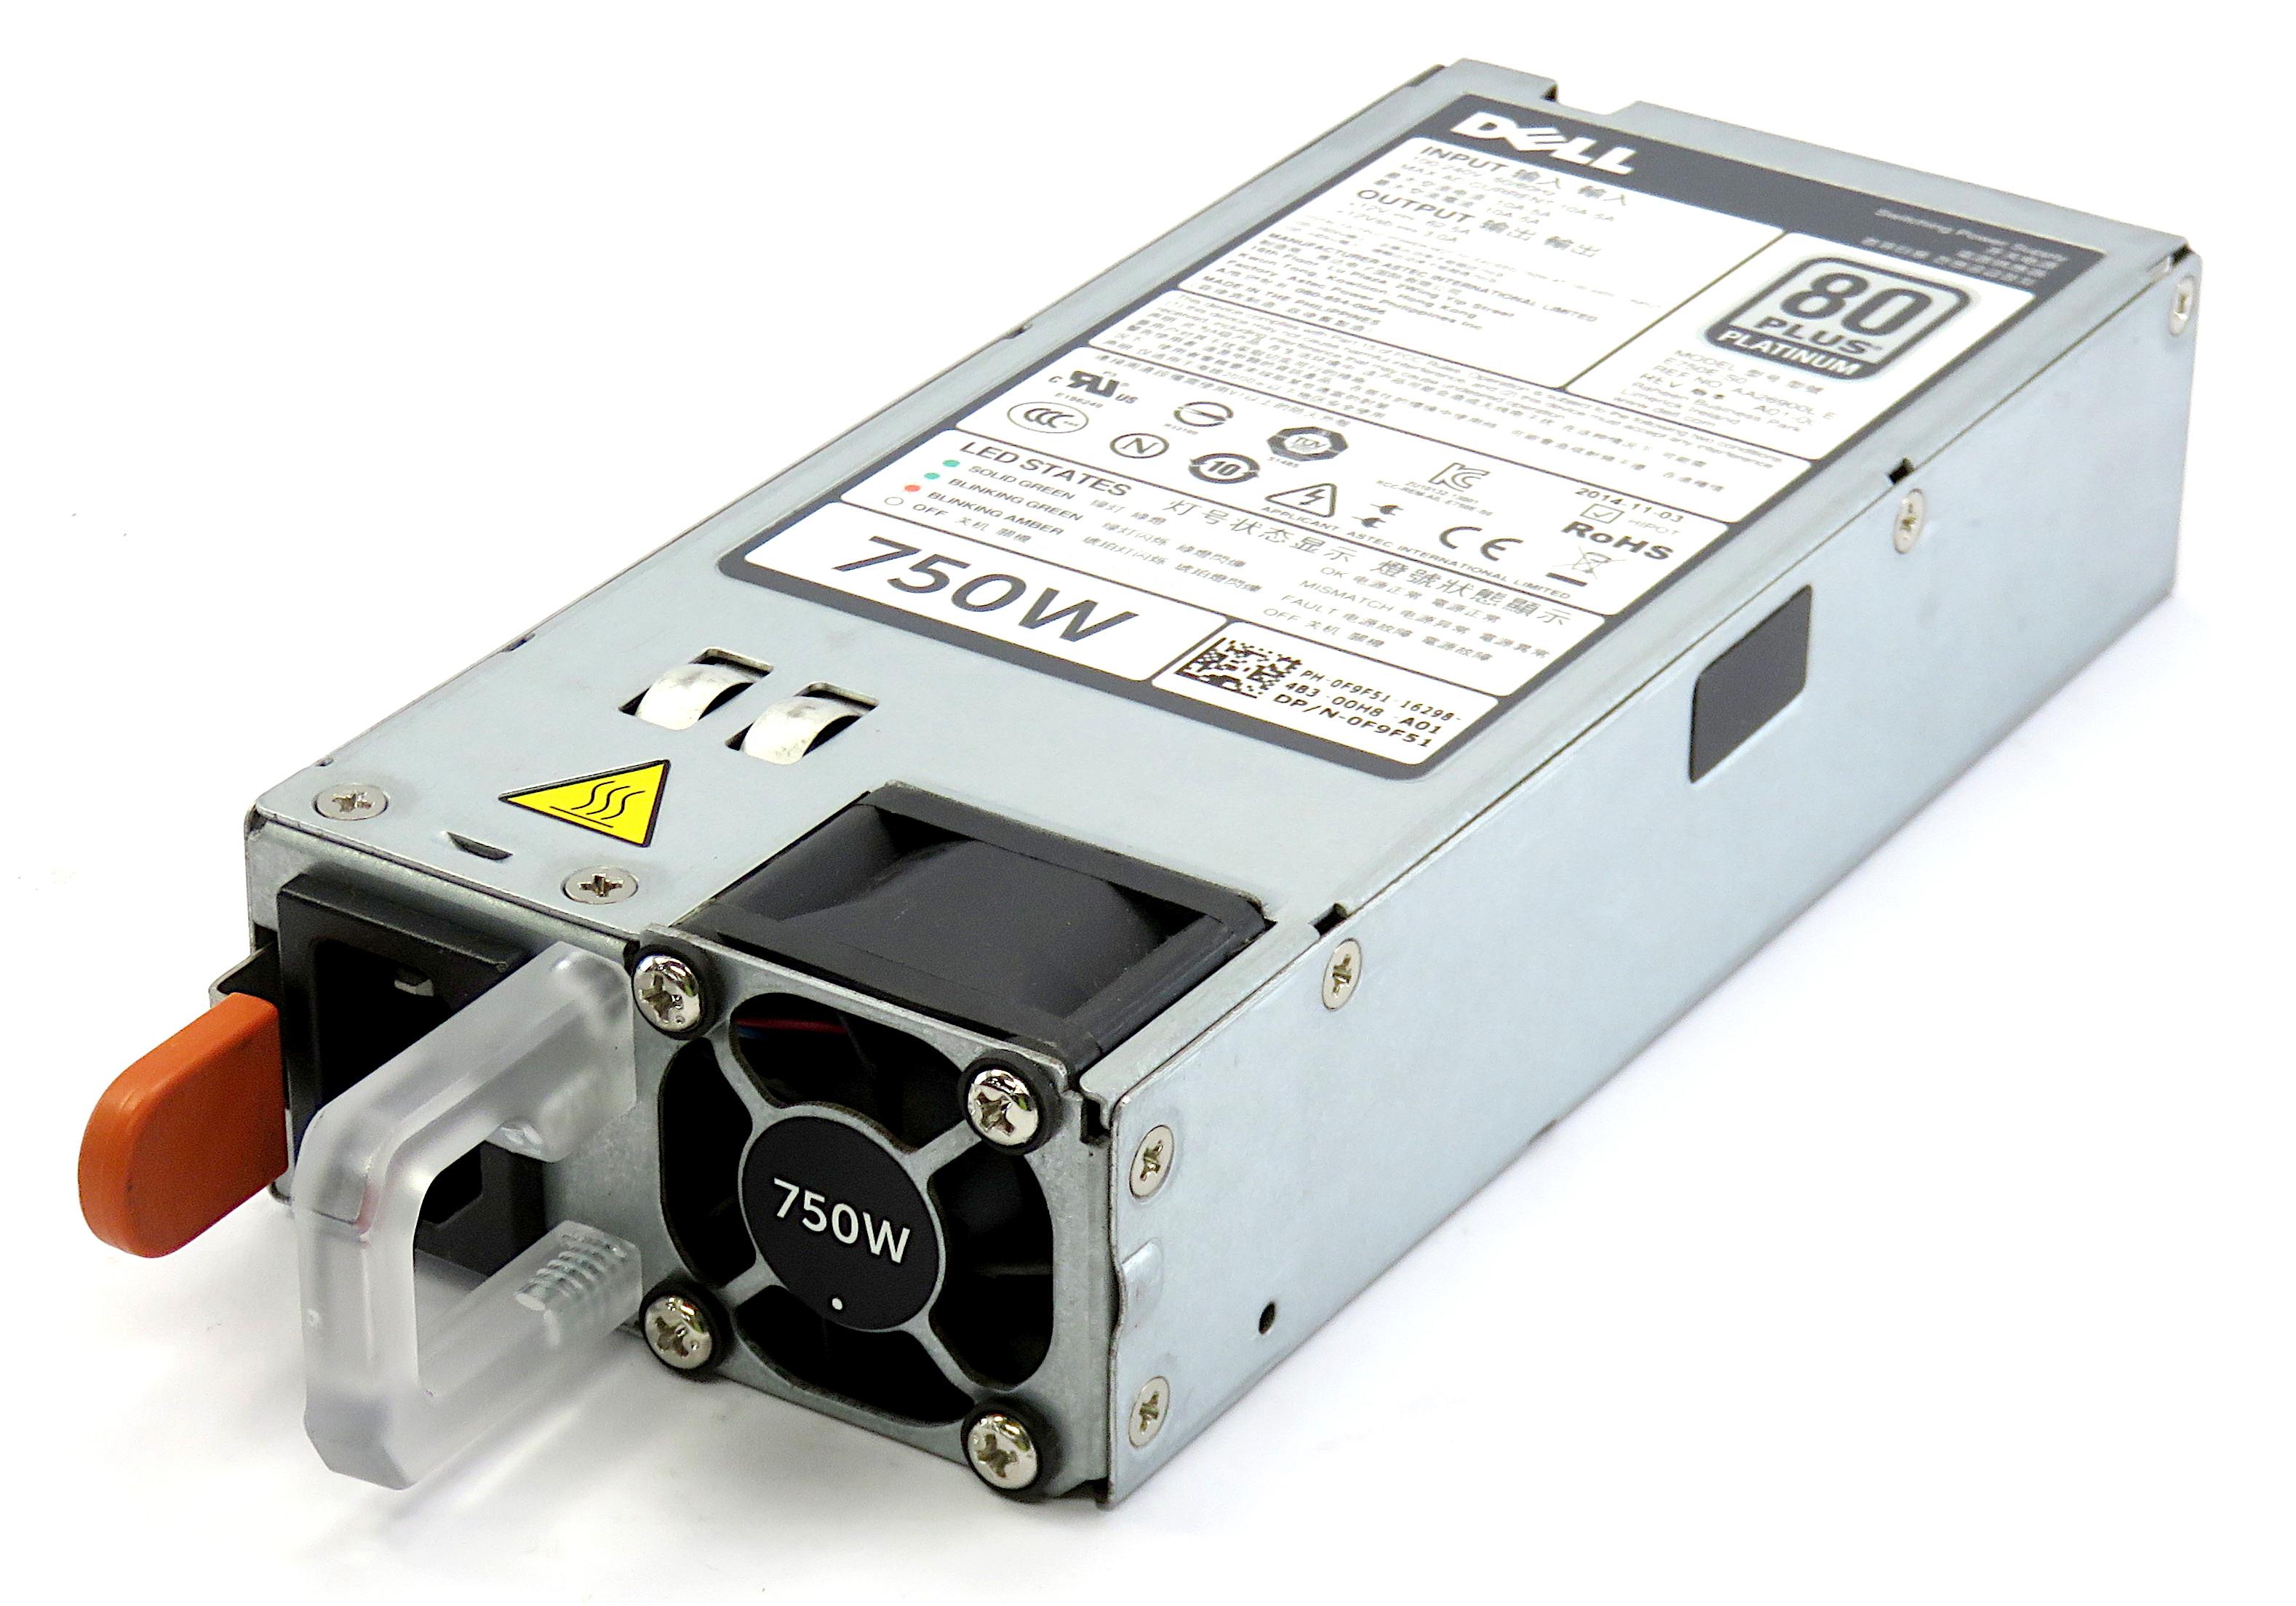 Dell 0F9F51 750W 80+ Platinum Redundant Power Supply E750E-S0 f/ PowerEdge T320